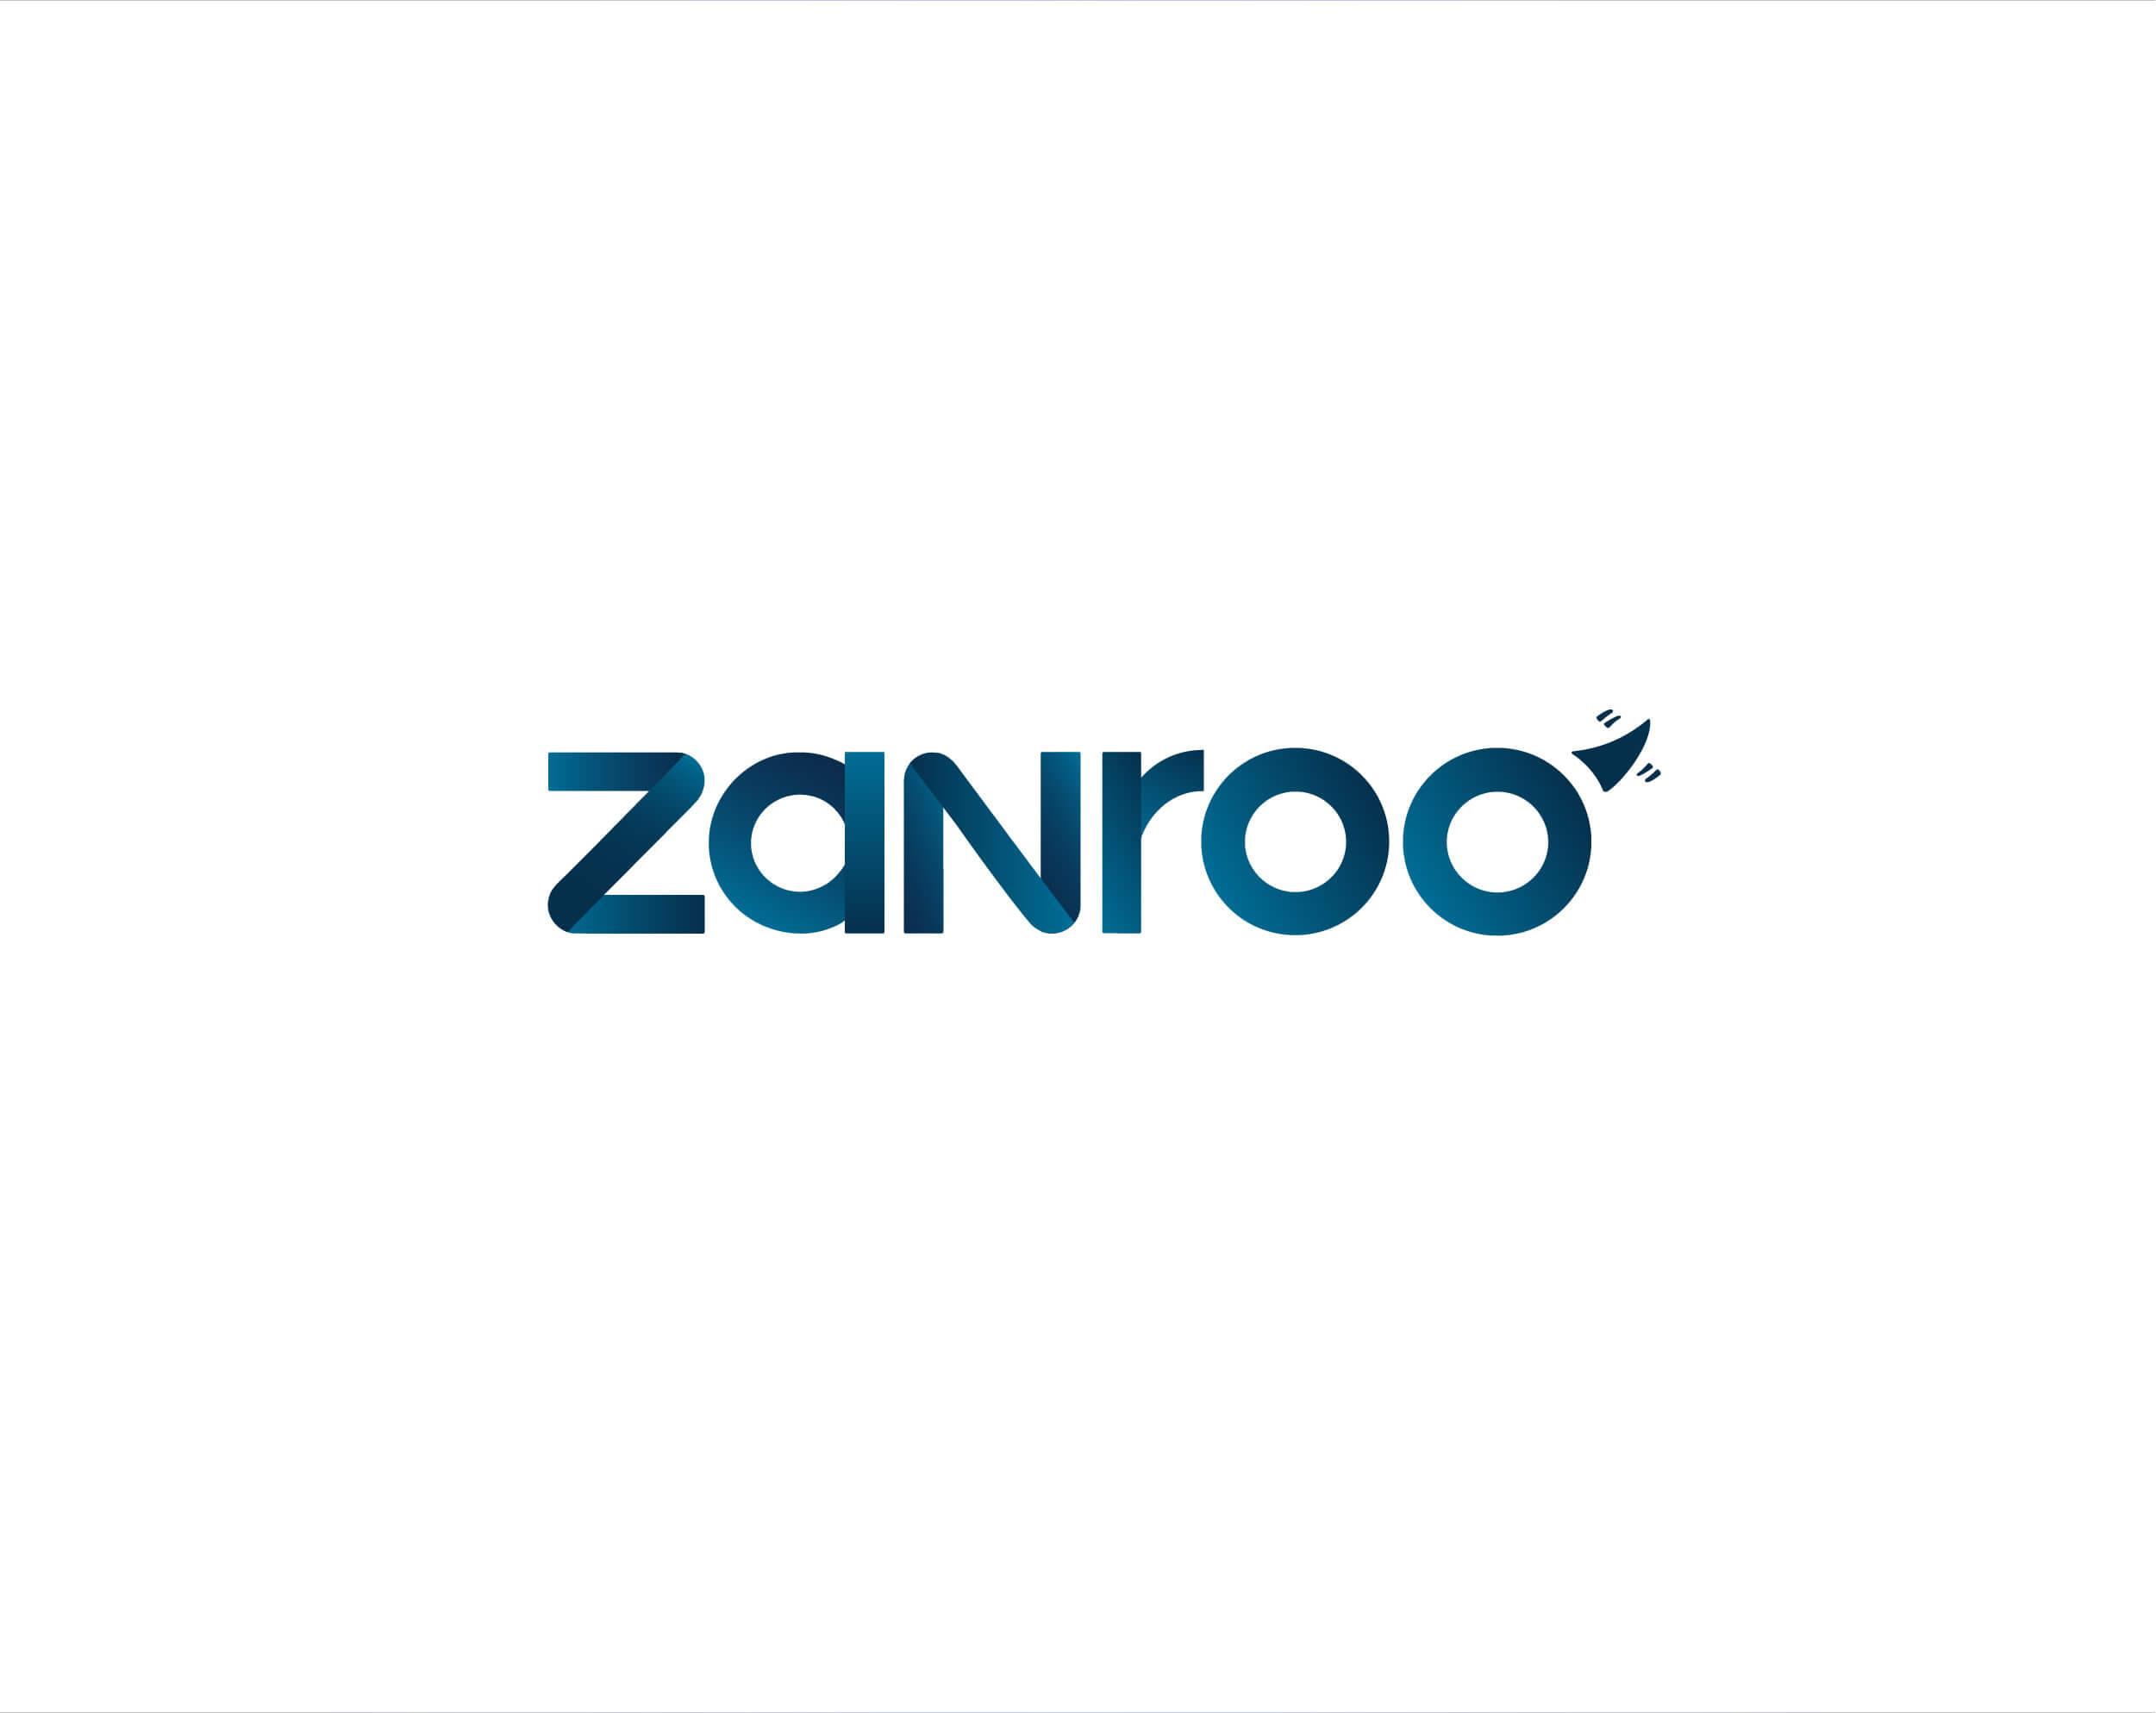 ZANROO